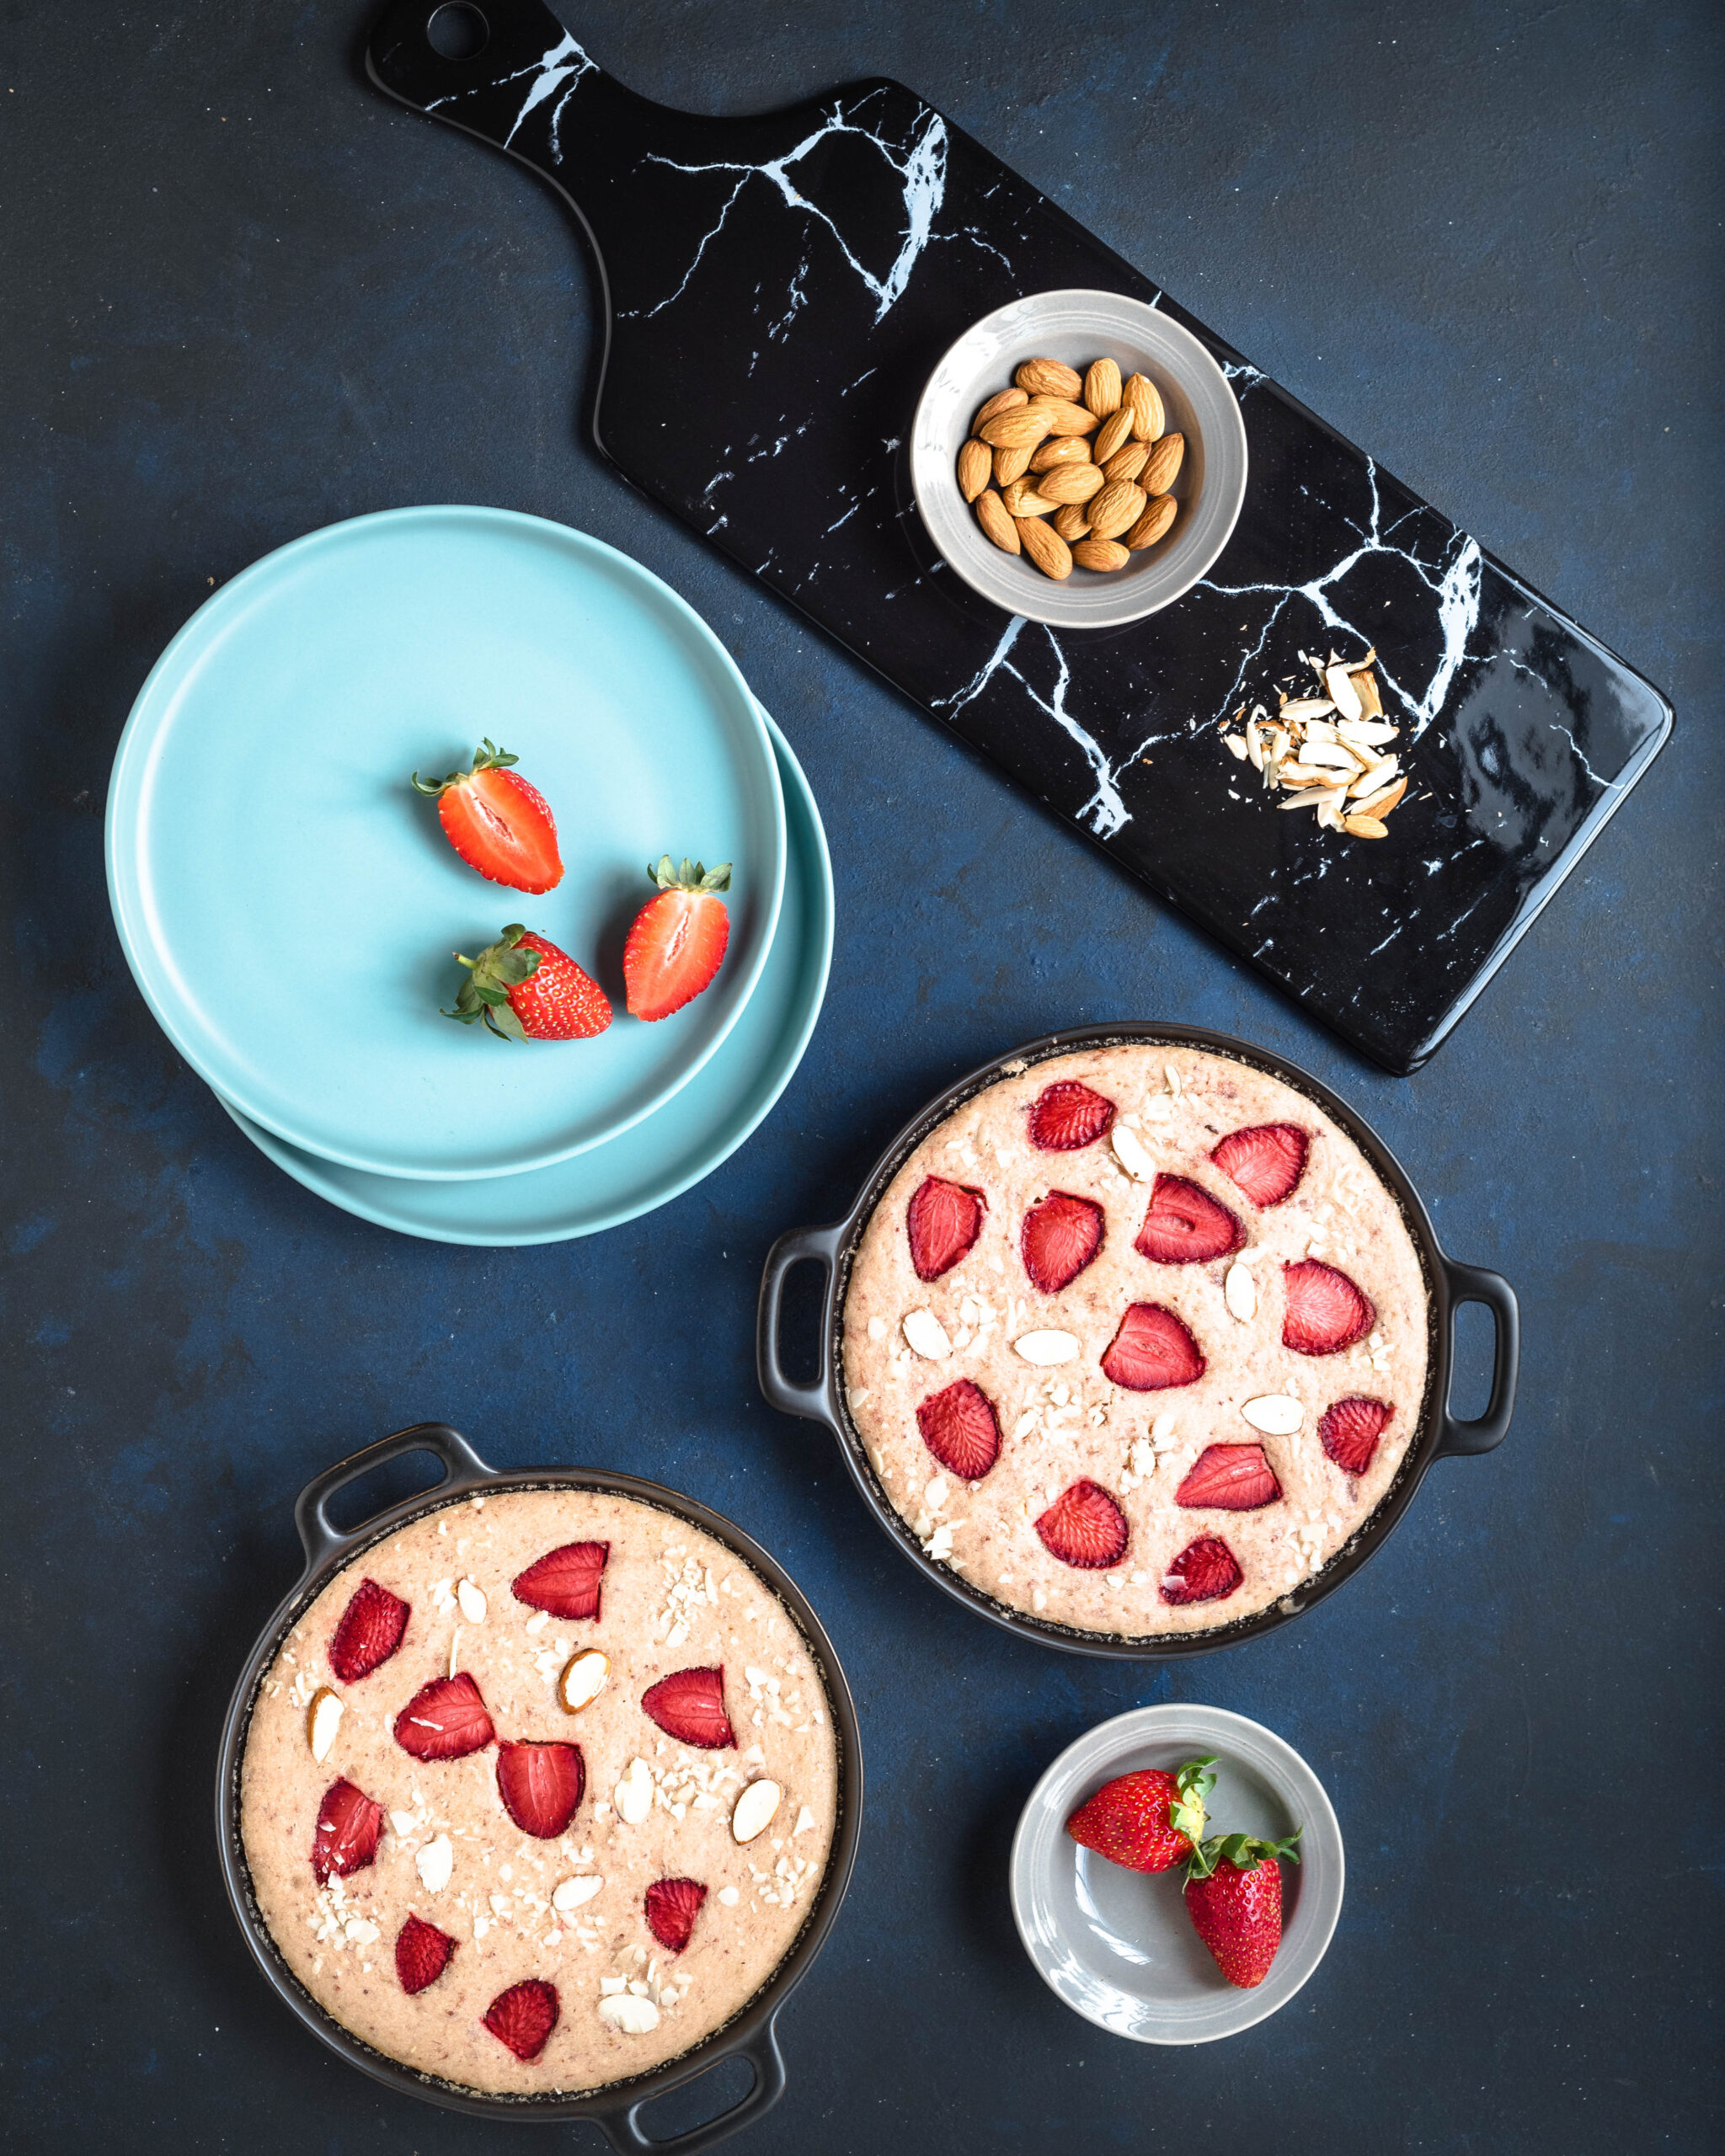 Strawberry Jam Tray Bake, jam bake, strawberry recipe, strawberry desserts, easy desserts, easy strawberry desserts